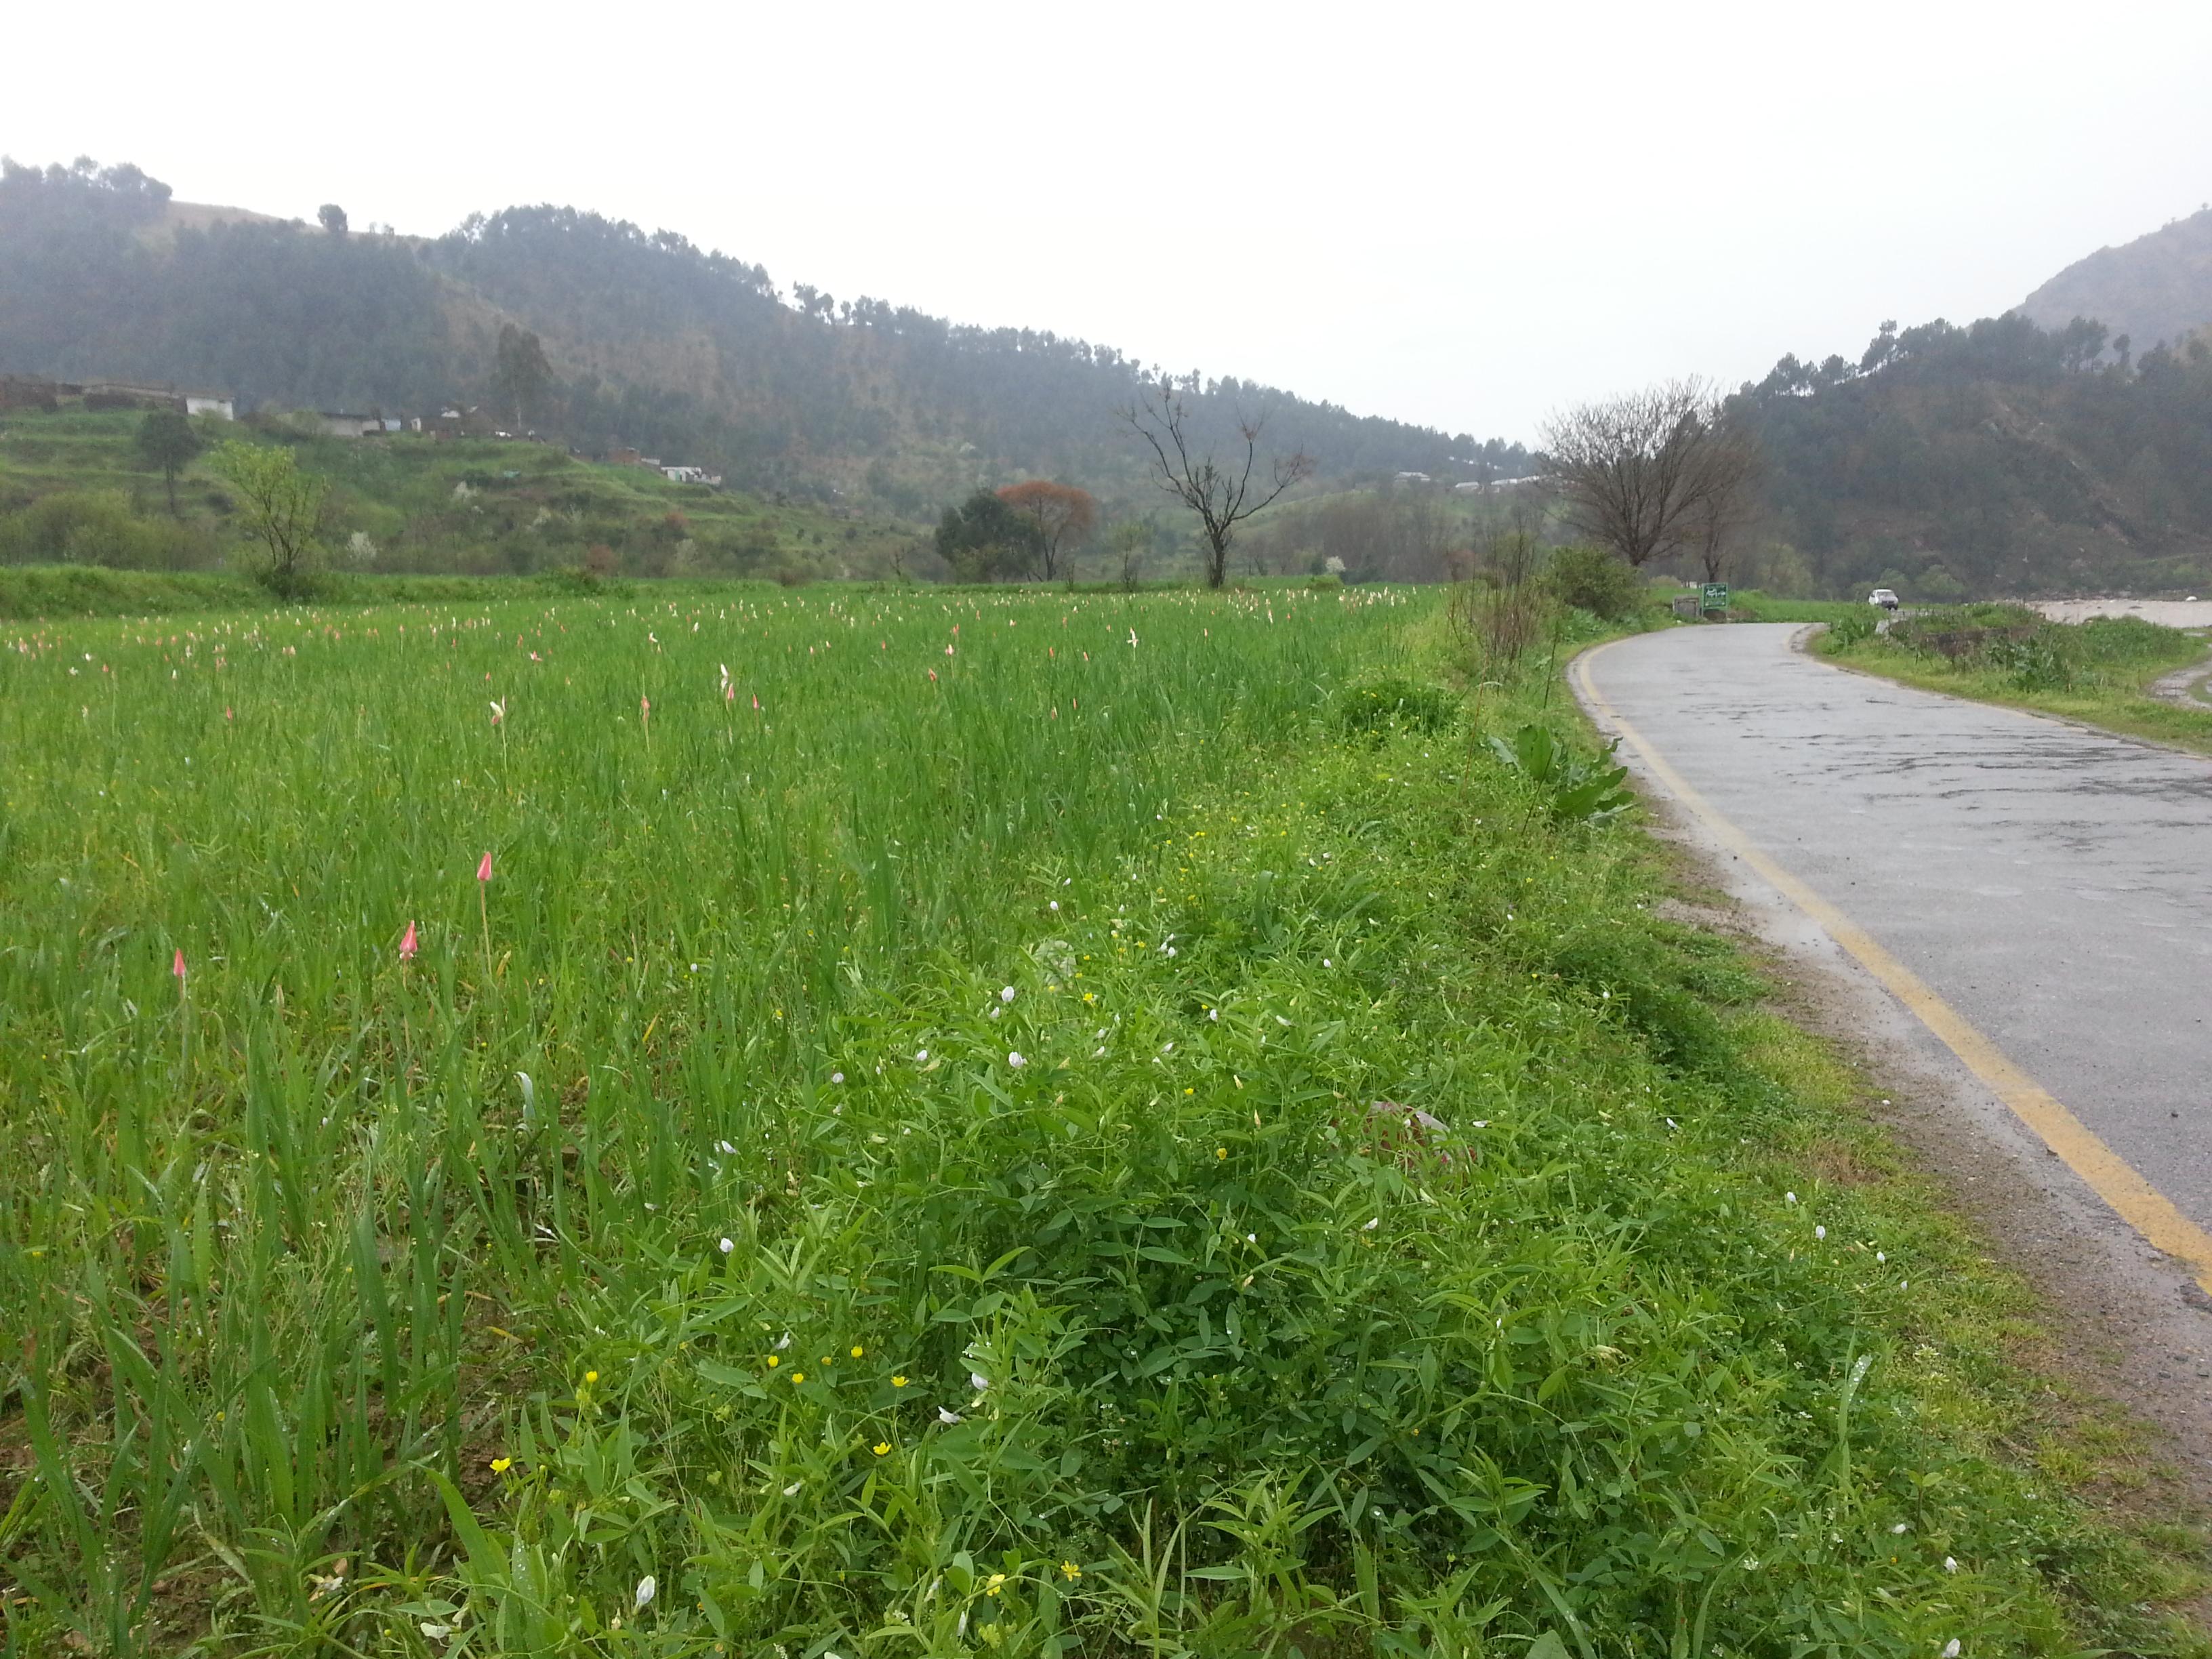 Ghanttol flowers & Wet road